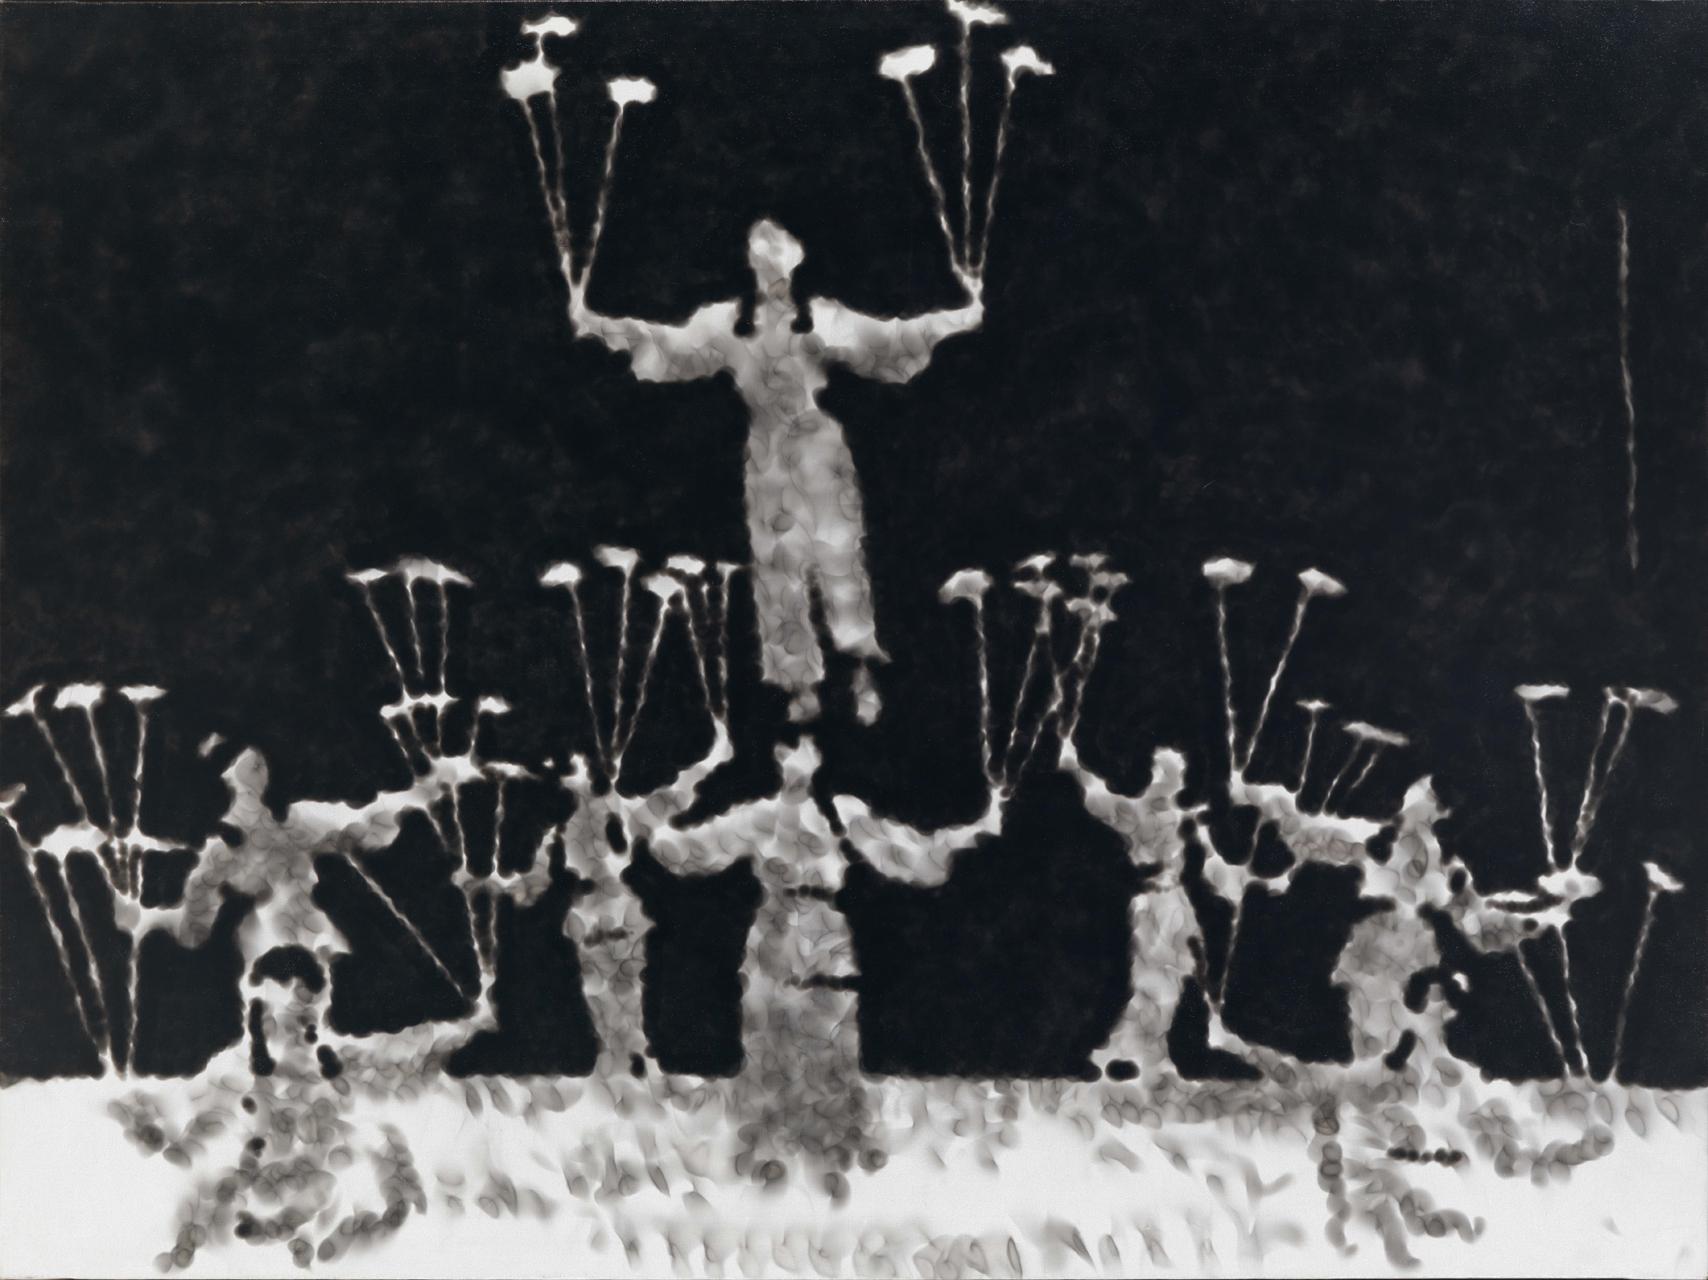 Jiří Georg Dokoupil, Jongleure, ca. 1991, Ruß auf grundierter Leinwand, 97 x 130 cm